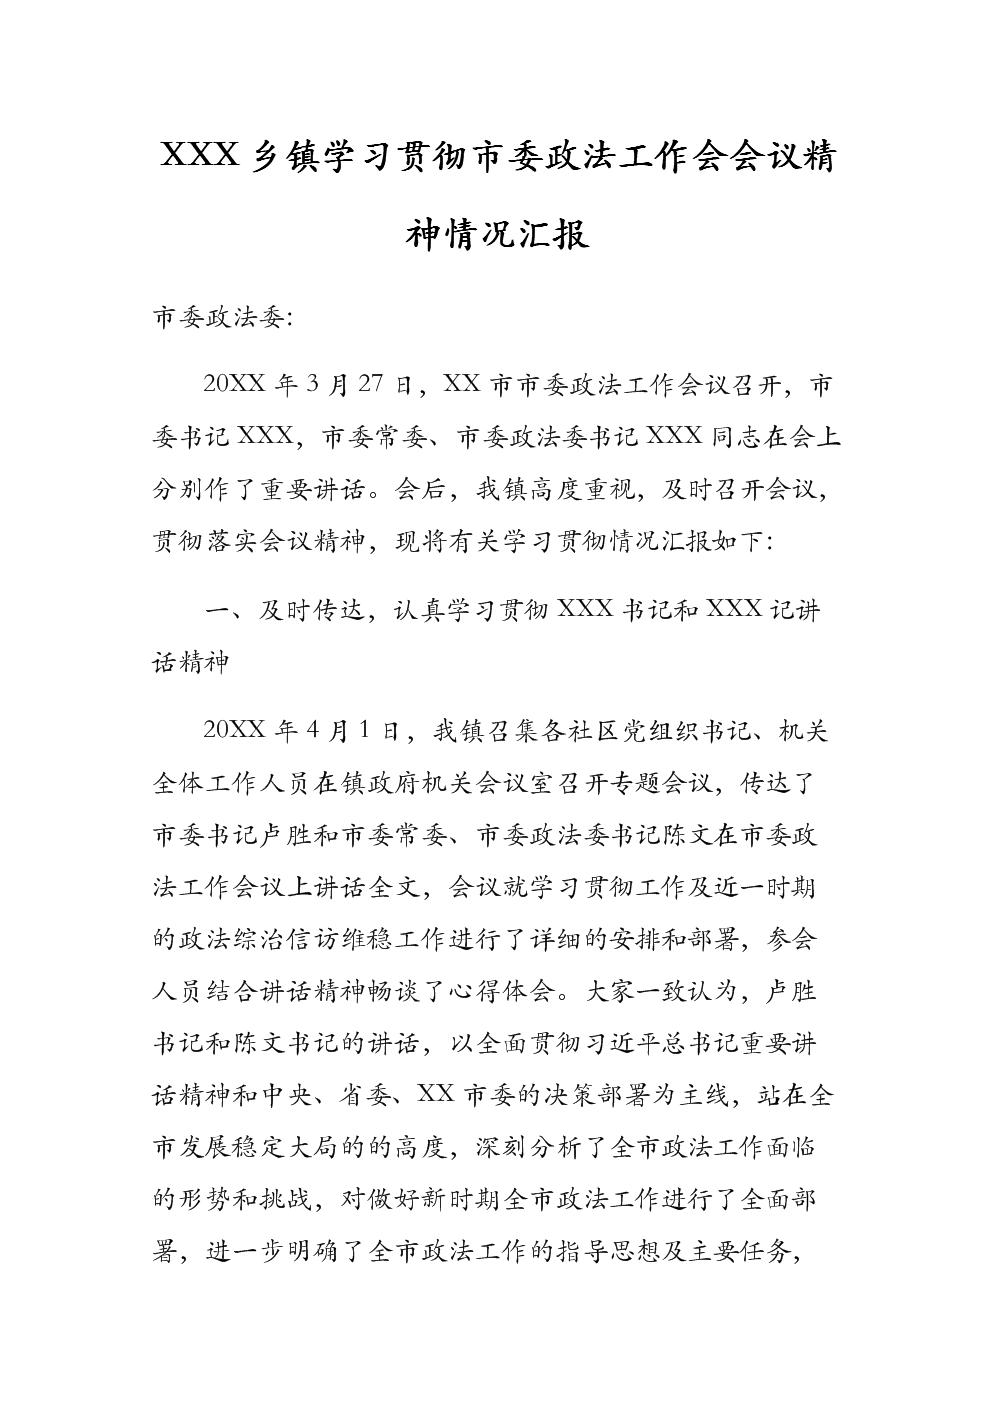 XXX乡镇学习贯彻市委政法工作会会议精神情况汇报.docx